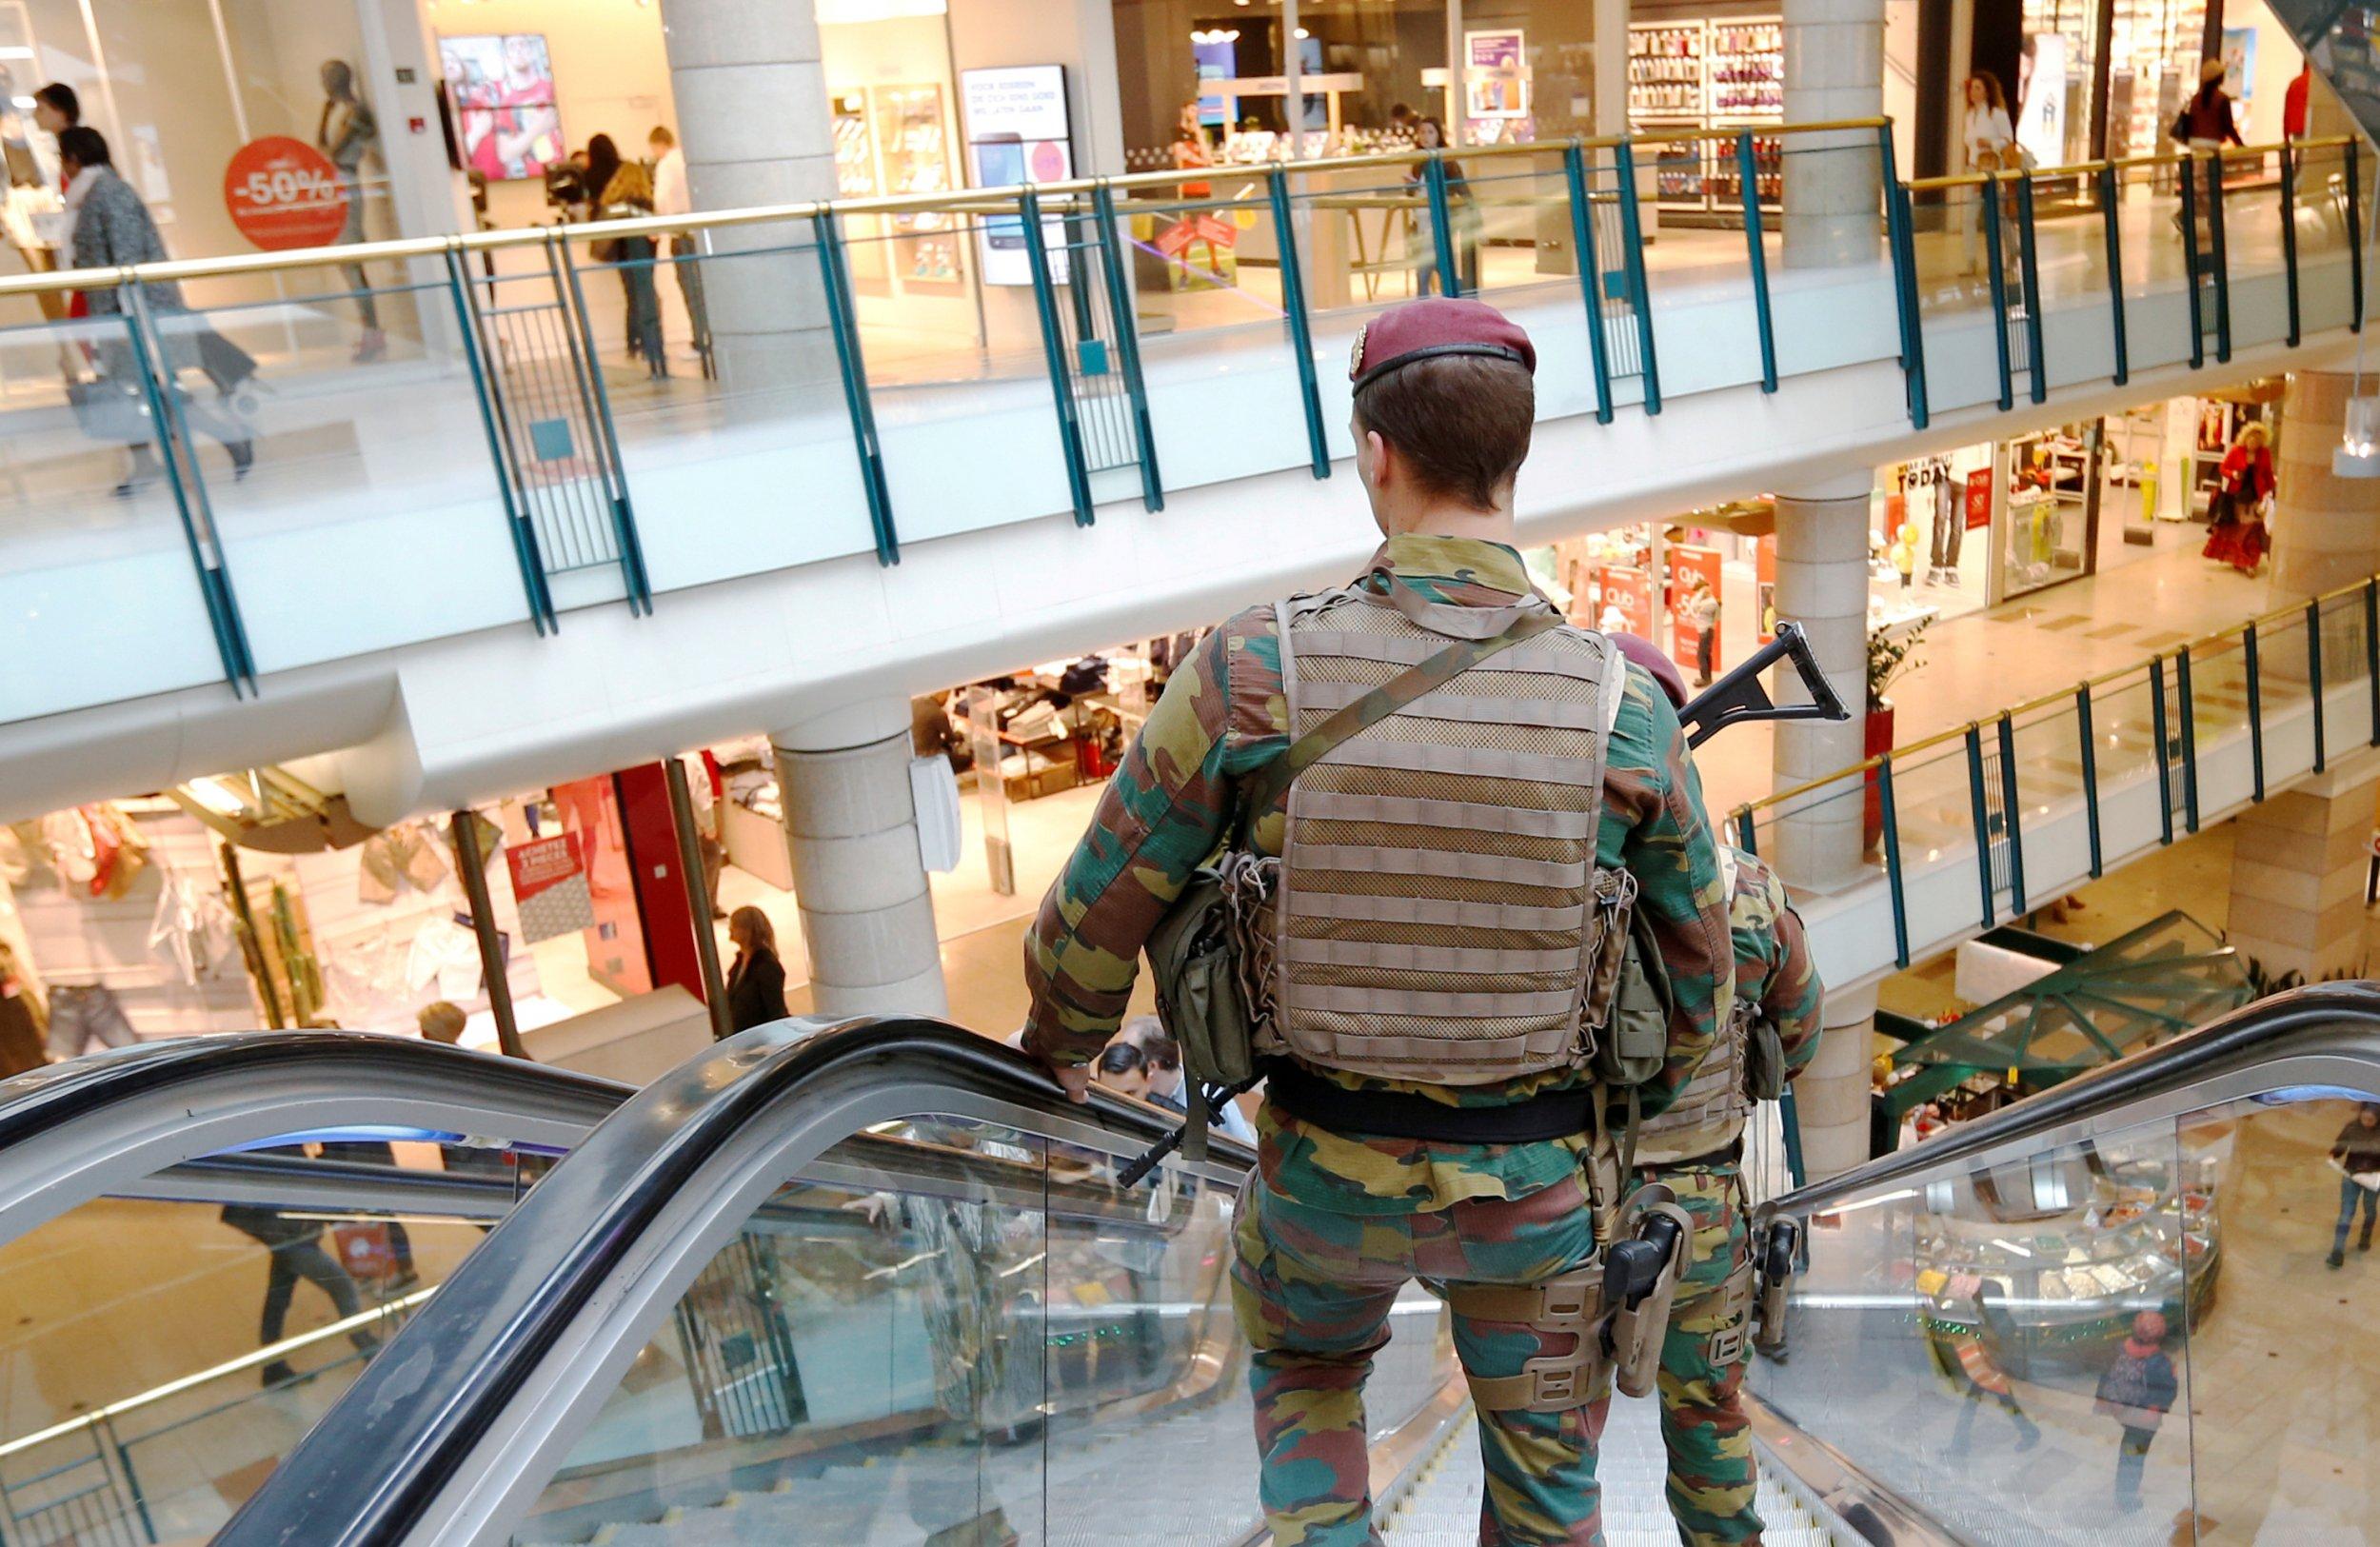 City2 mall